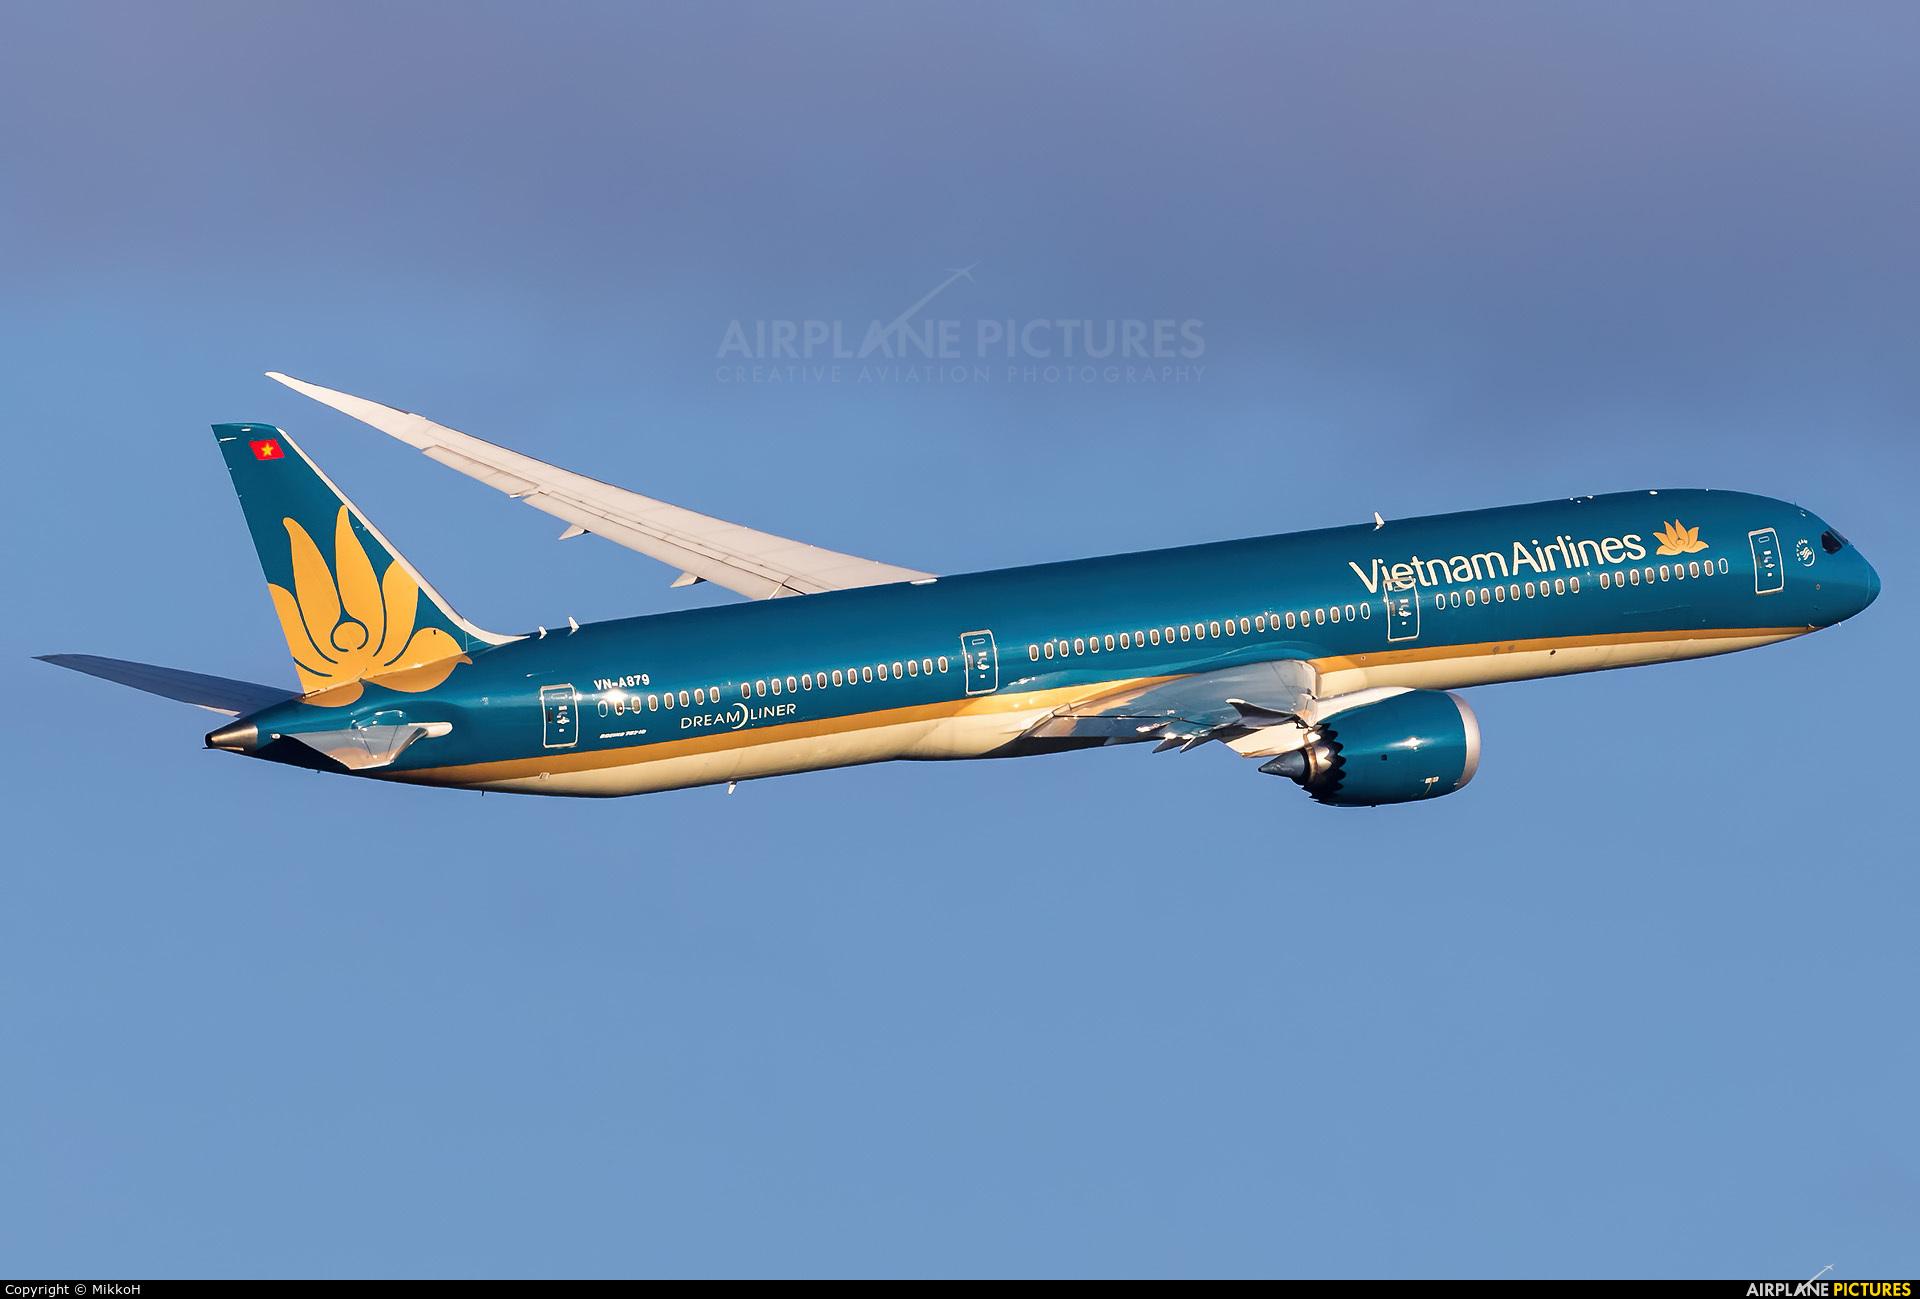 Vietnam Airlines VN-A879 aircraft at Helsinki - Vantaa